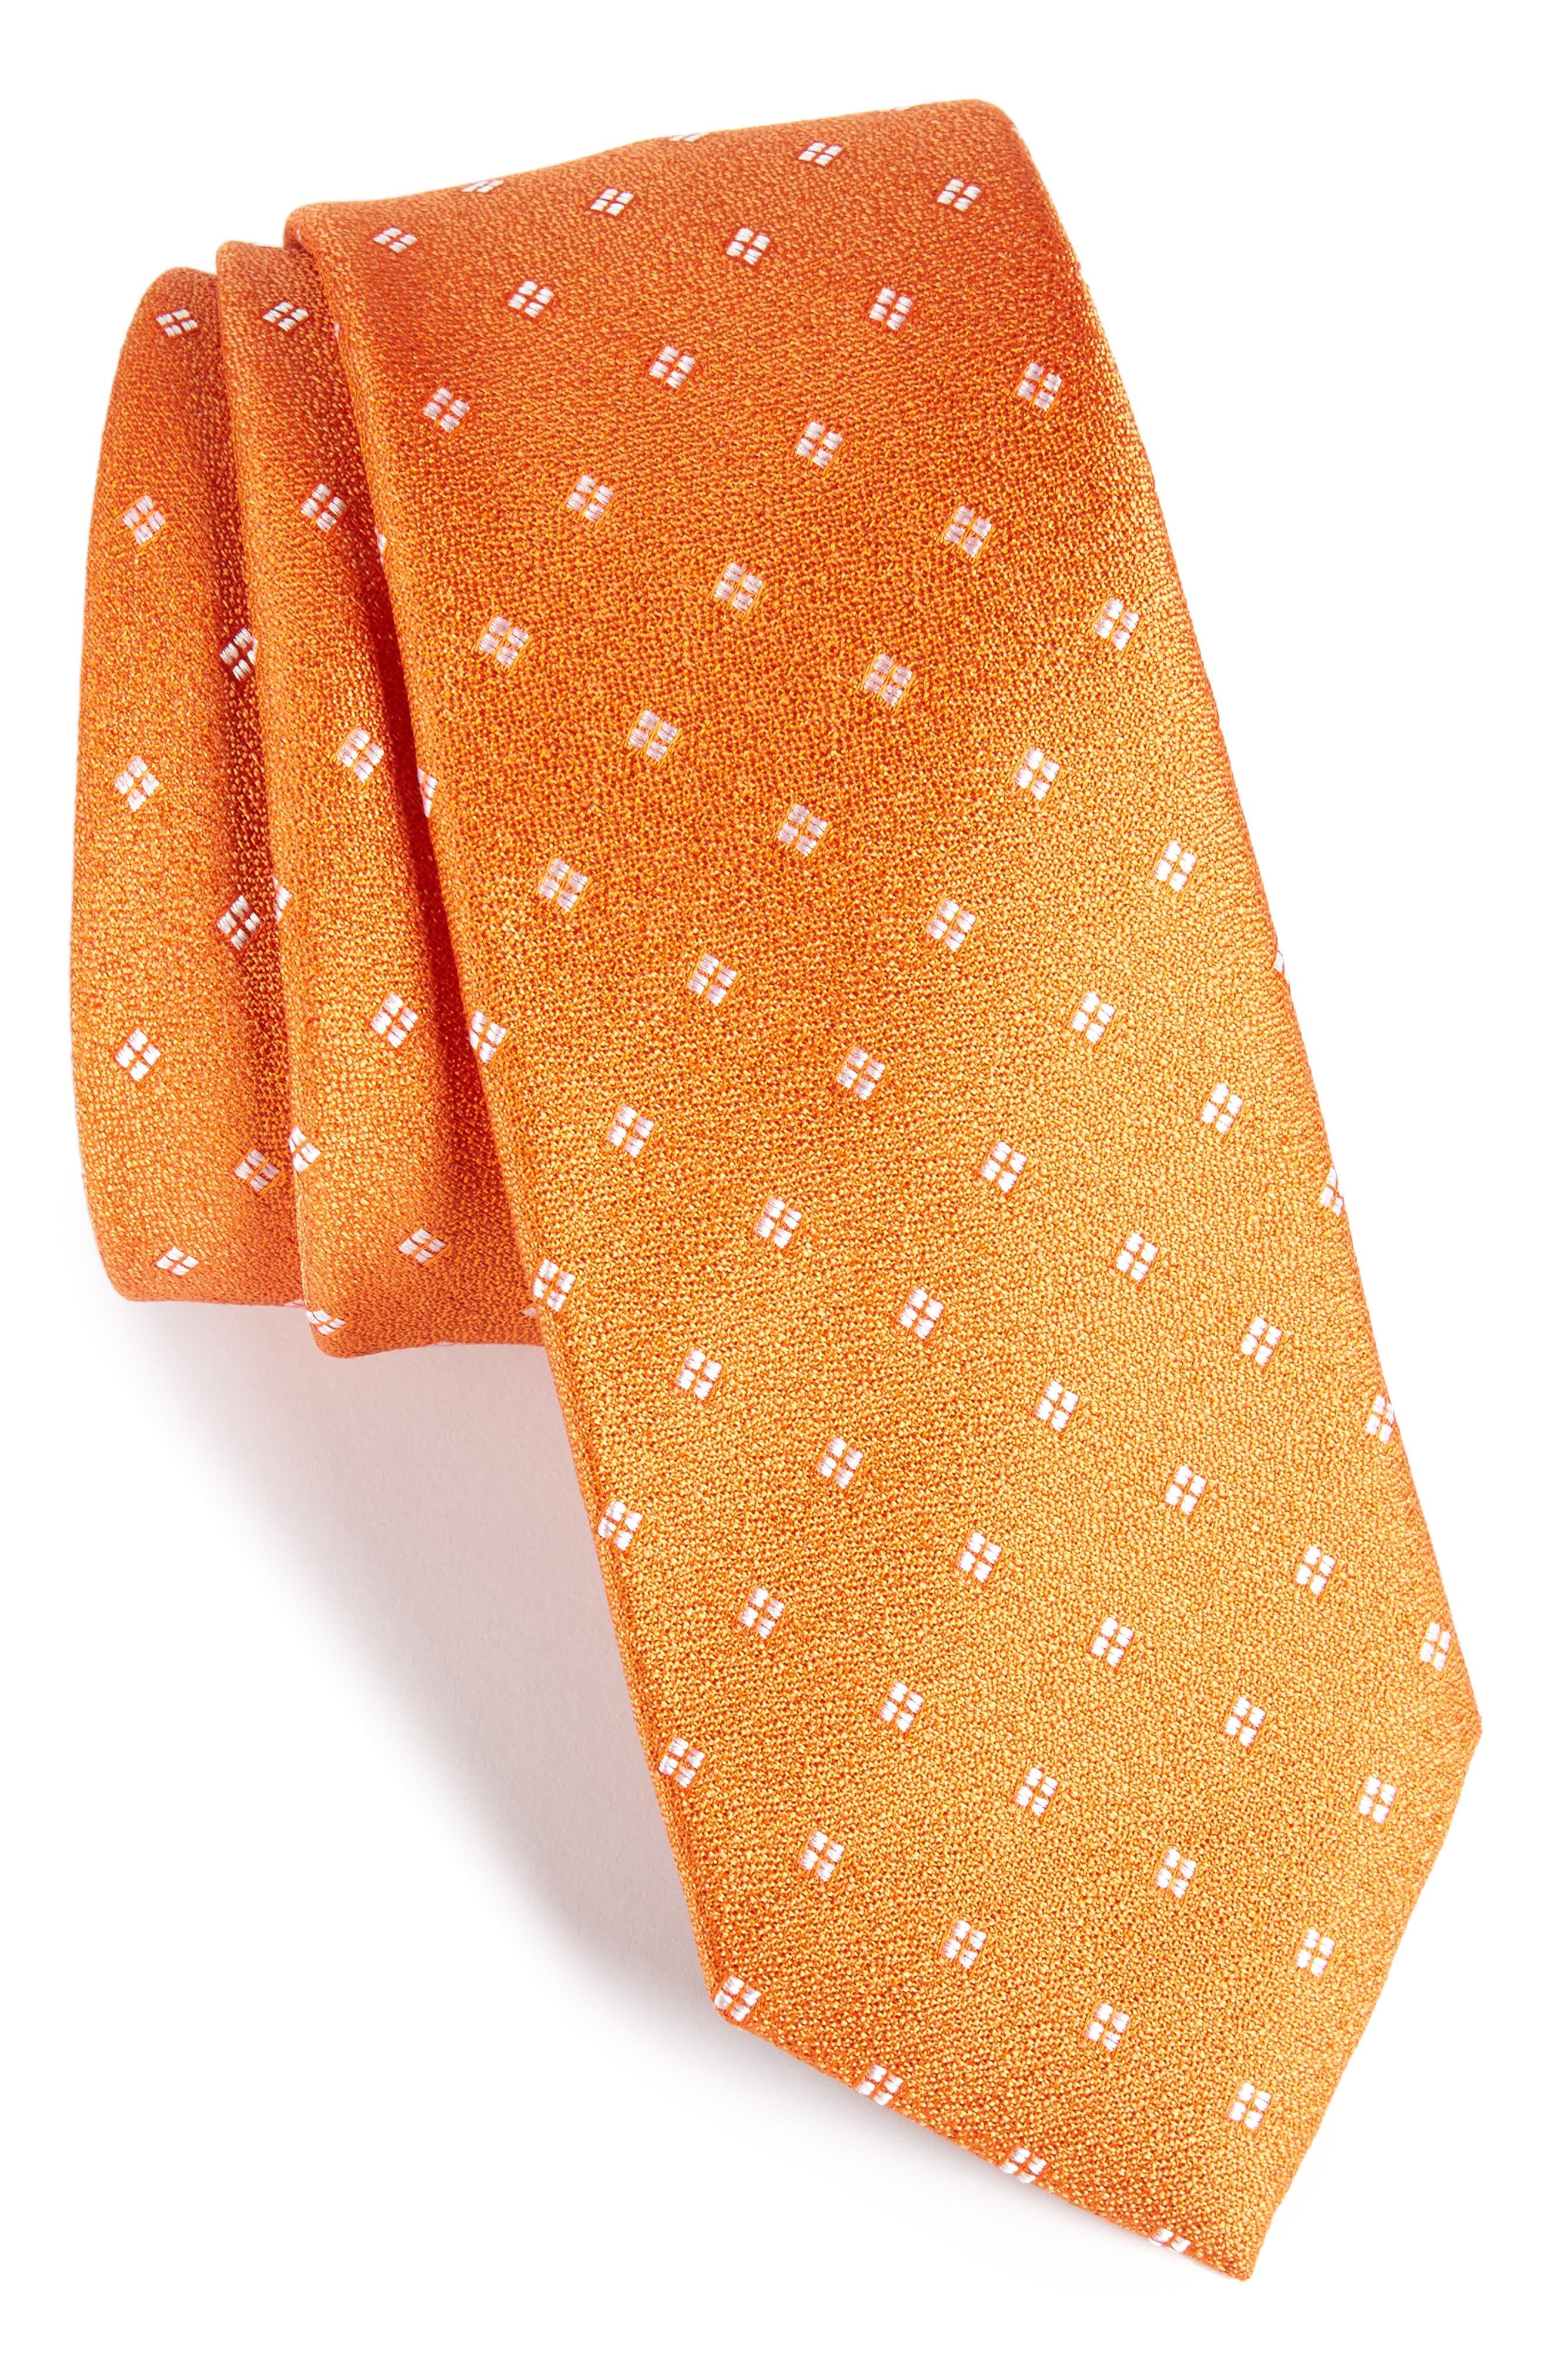 Moten Neat Silk Skinny Tie,                             Main thumbnail 1, color,                             Orange